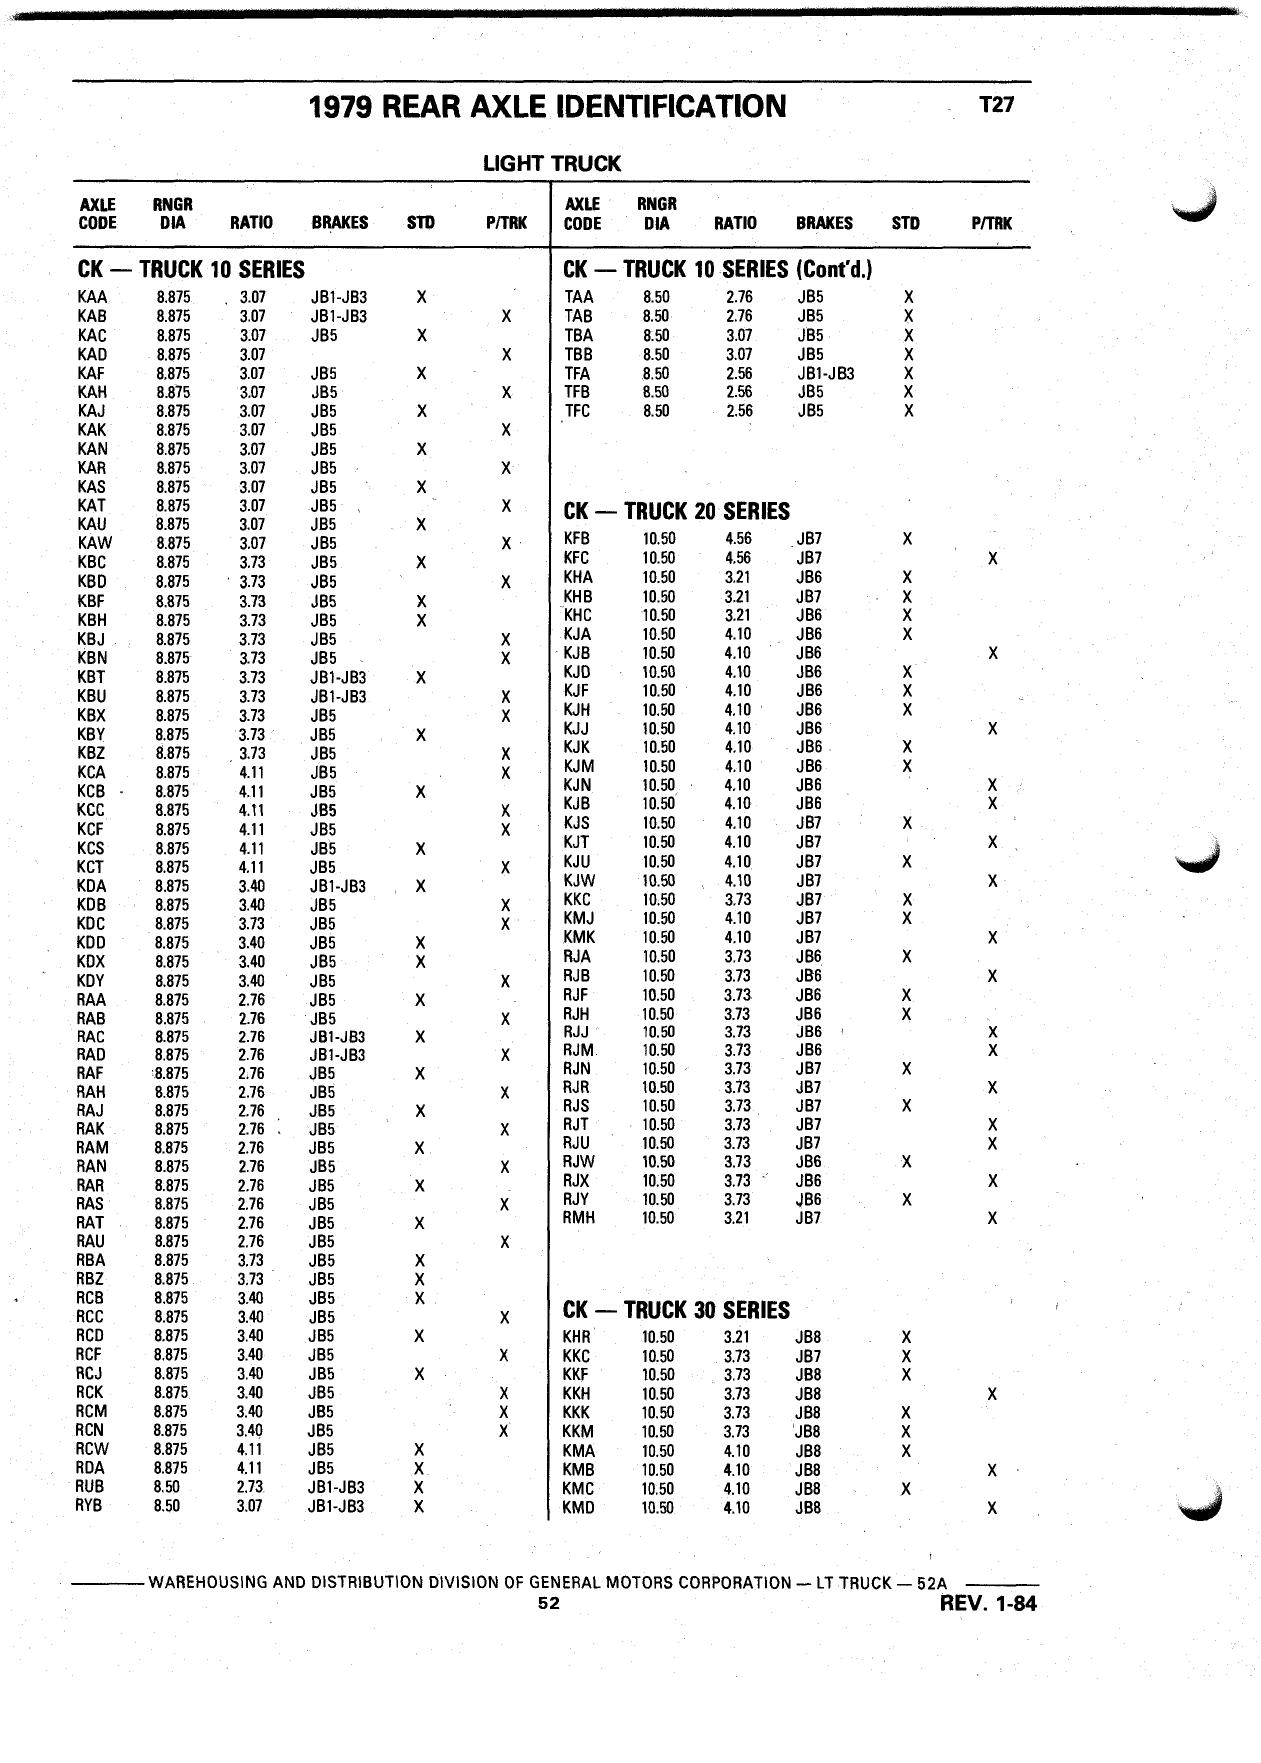 Ford F250 Rear Axle Identification